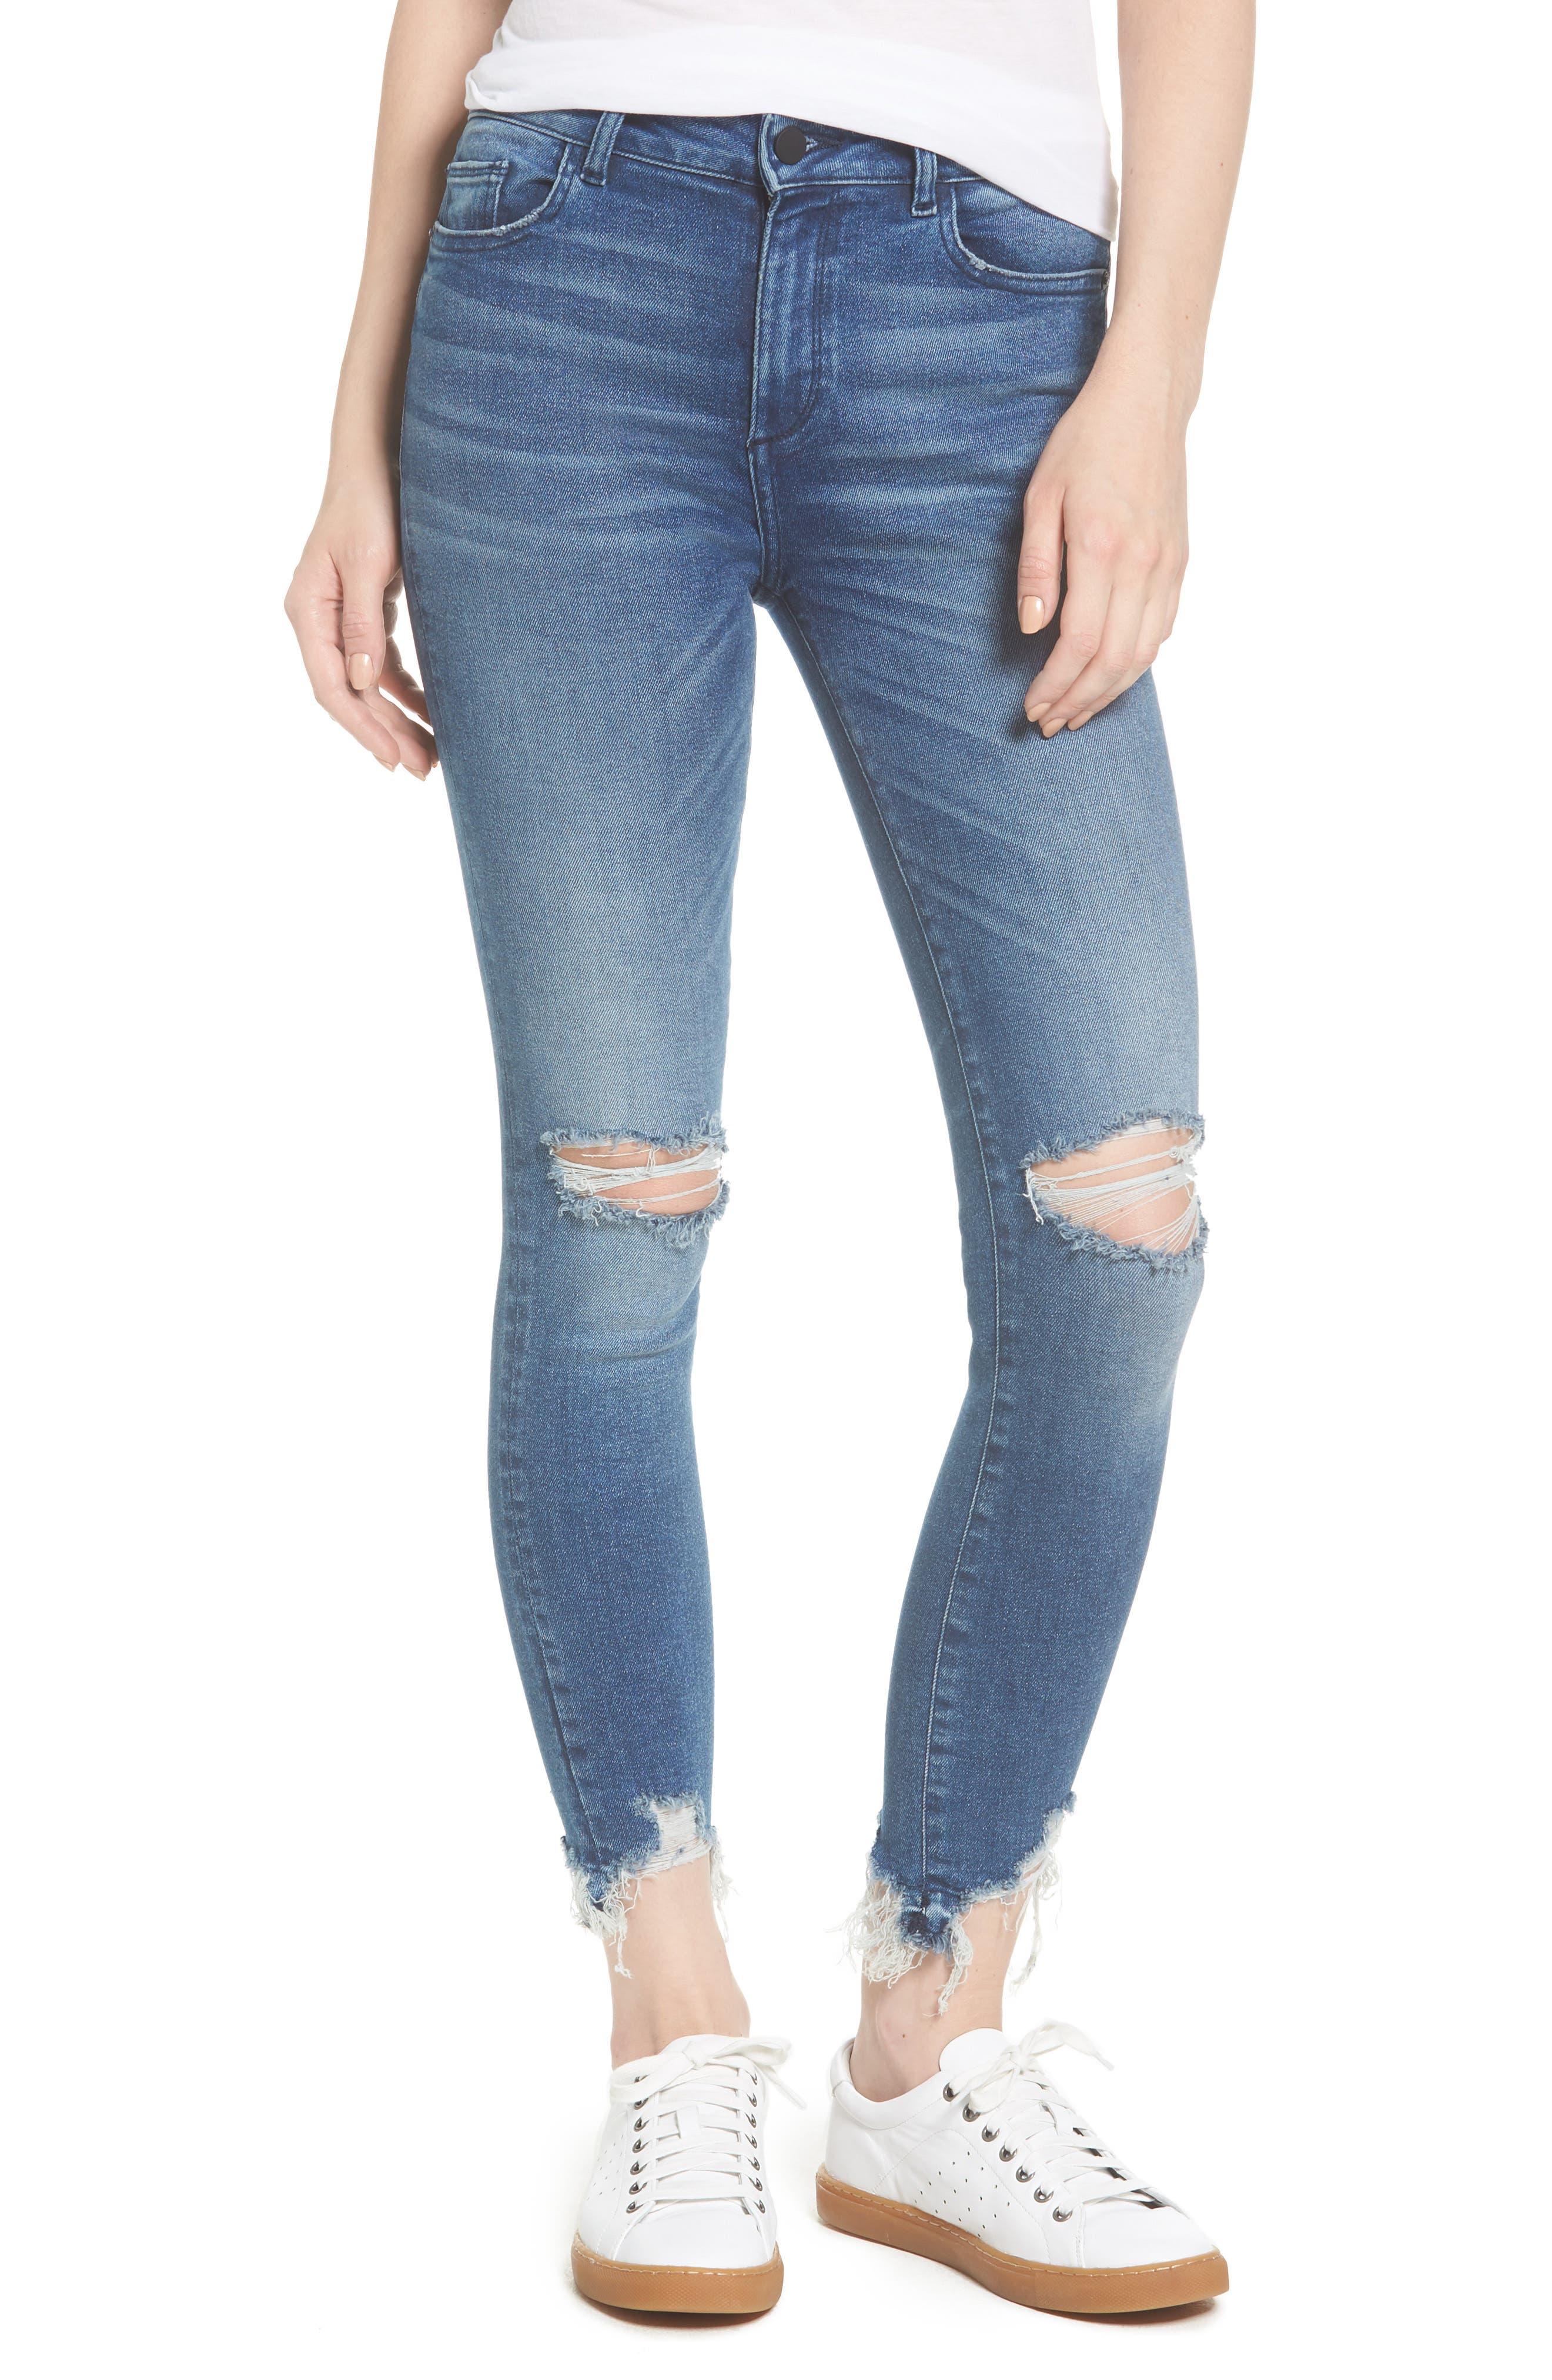 Farrow Instaslim High Waist Ankle Skinny Jeans,                             Main thumbnail 1, color,                             Laramie